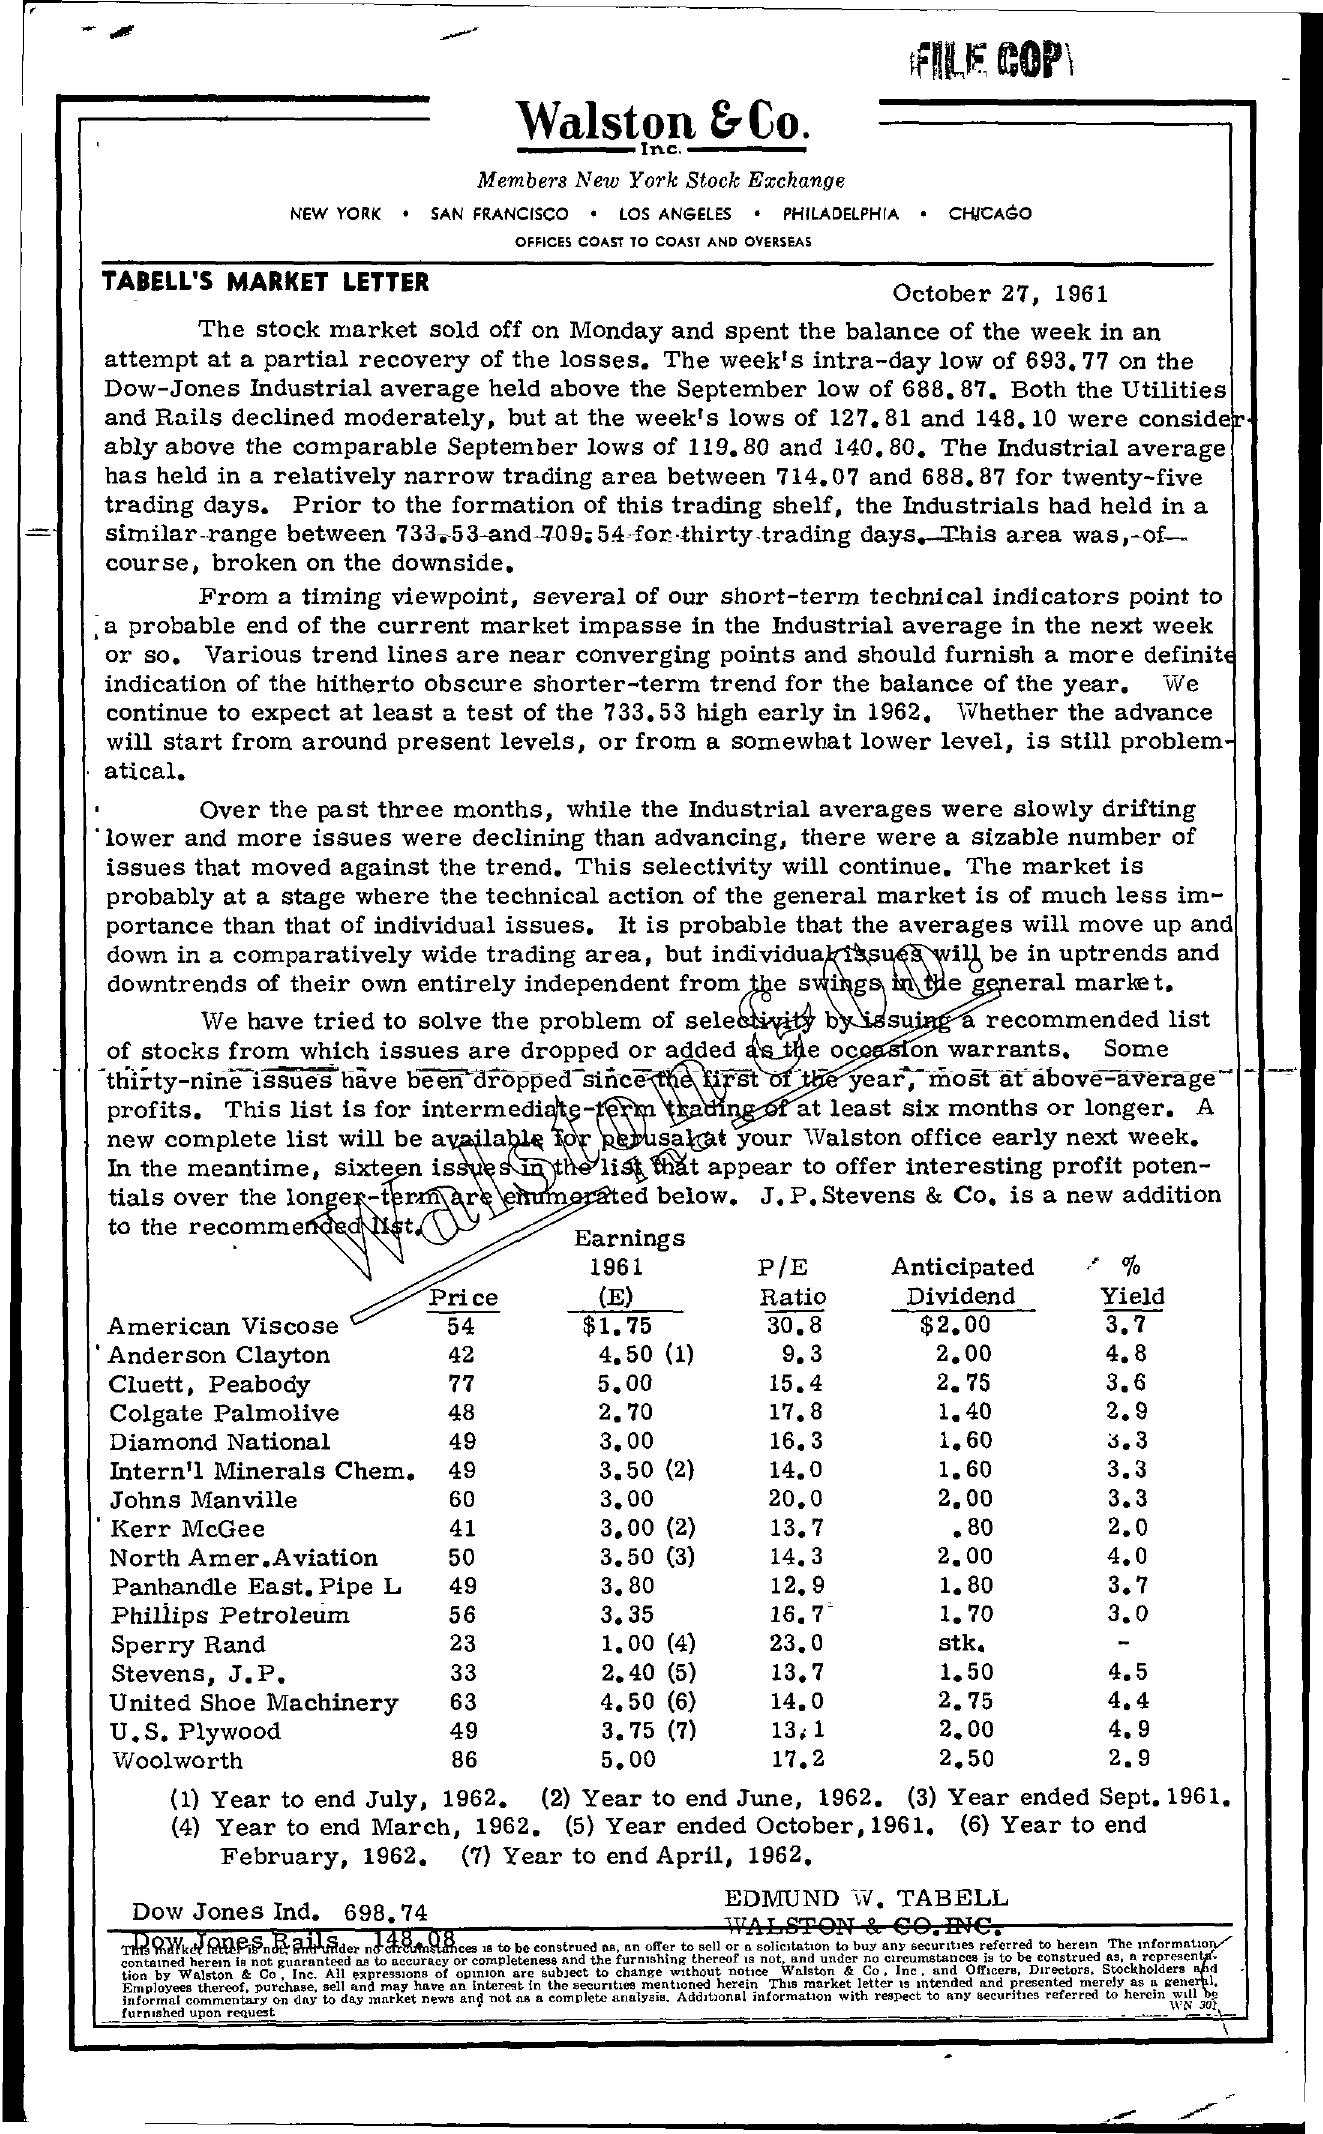 Tabell's Market Letter - October 27, 1961